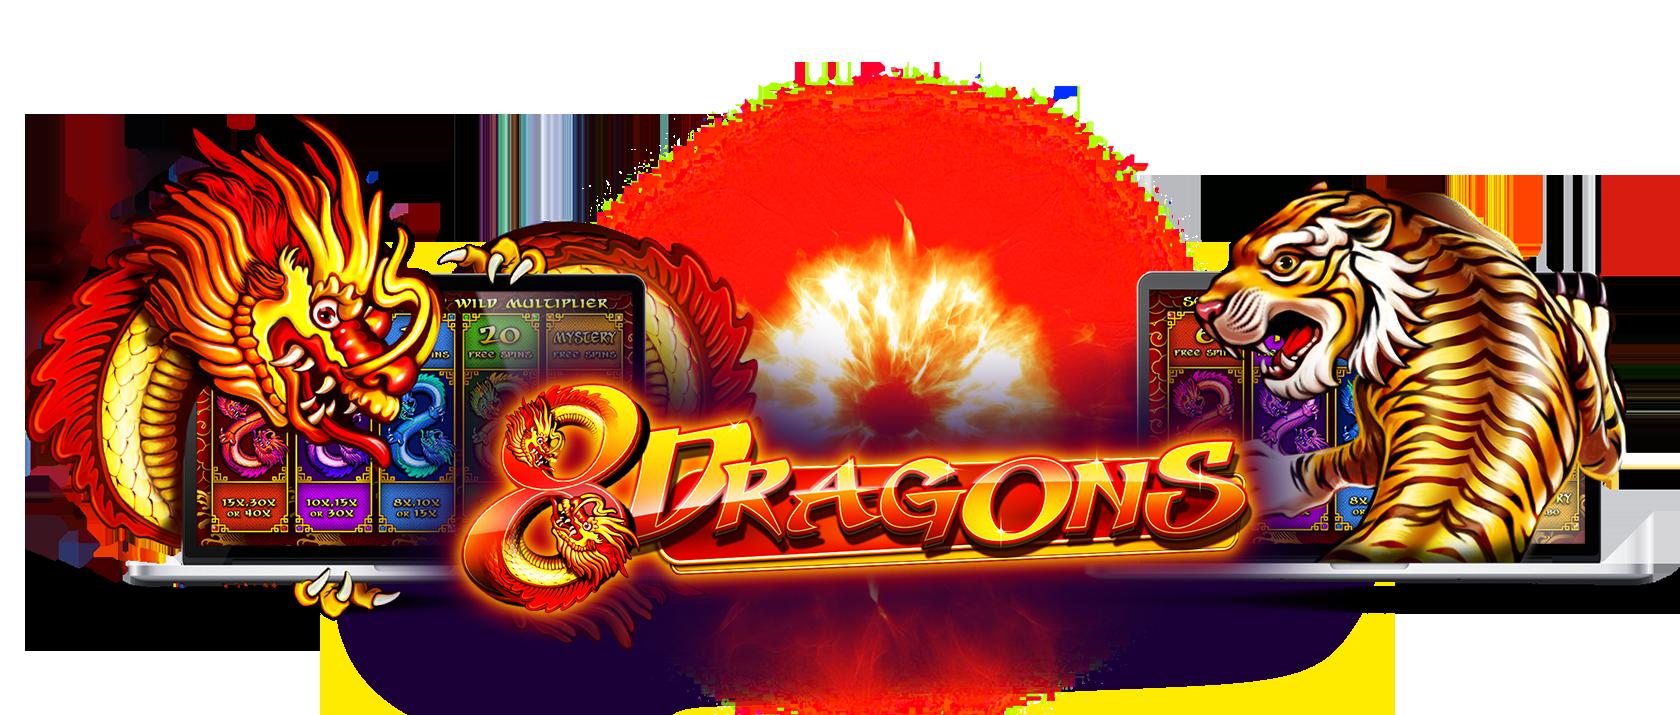 Pragmatic Play 8 Dragons Slot Machine